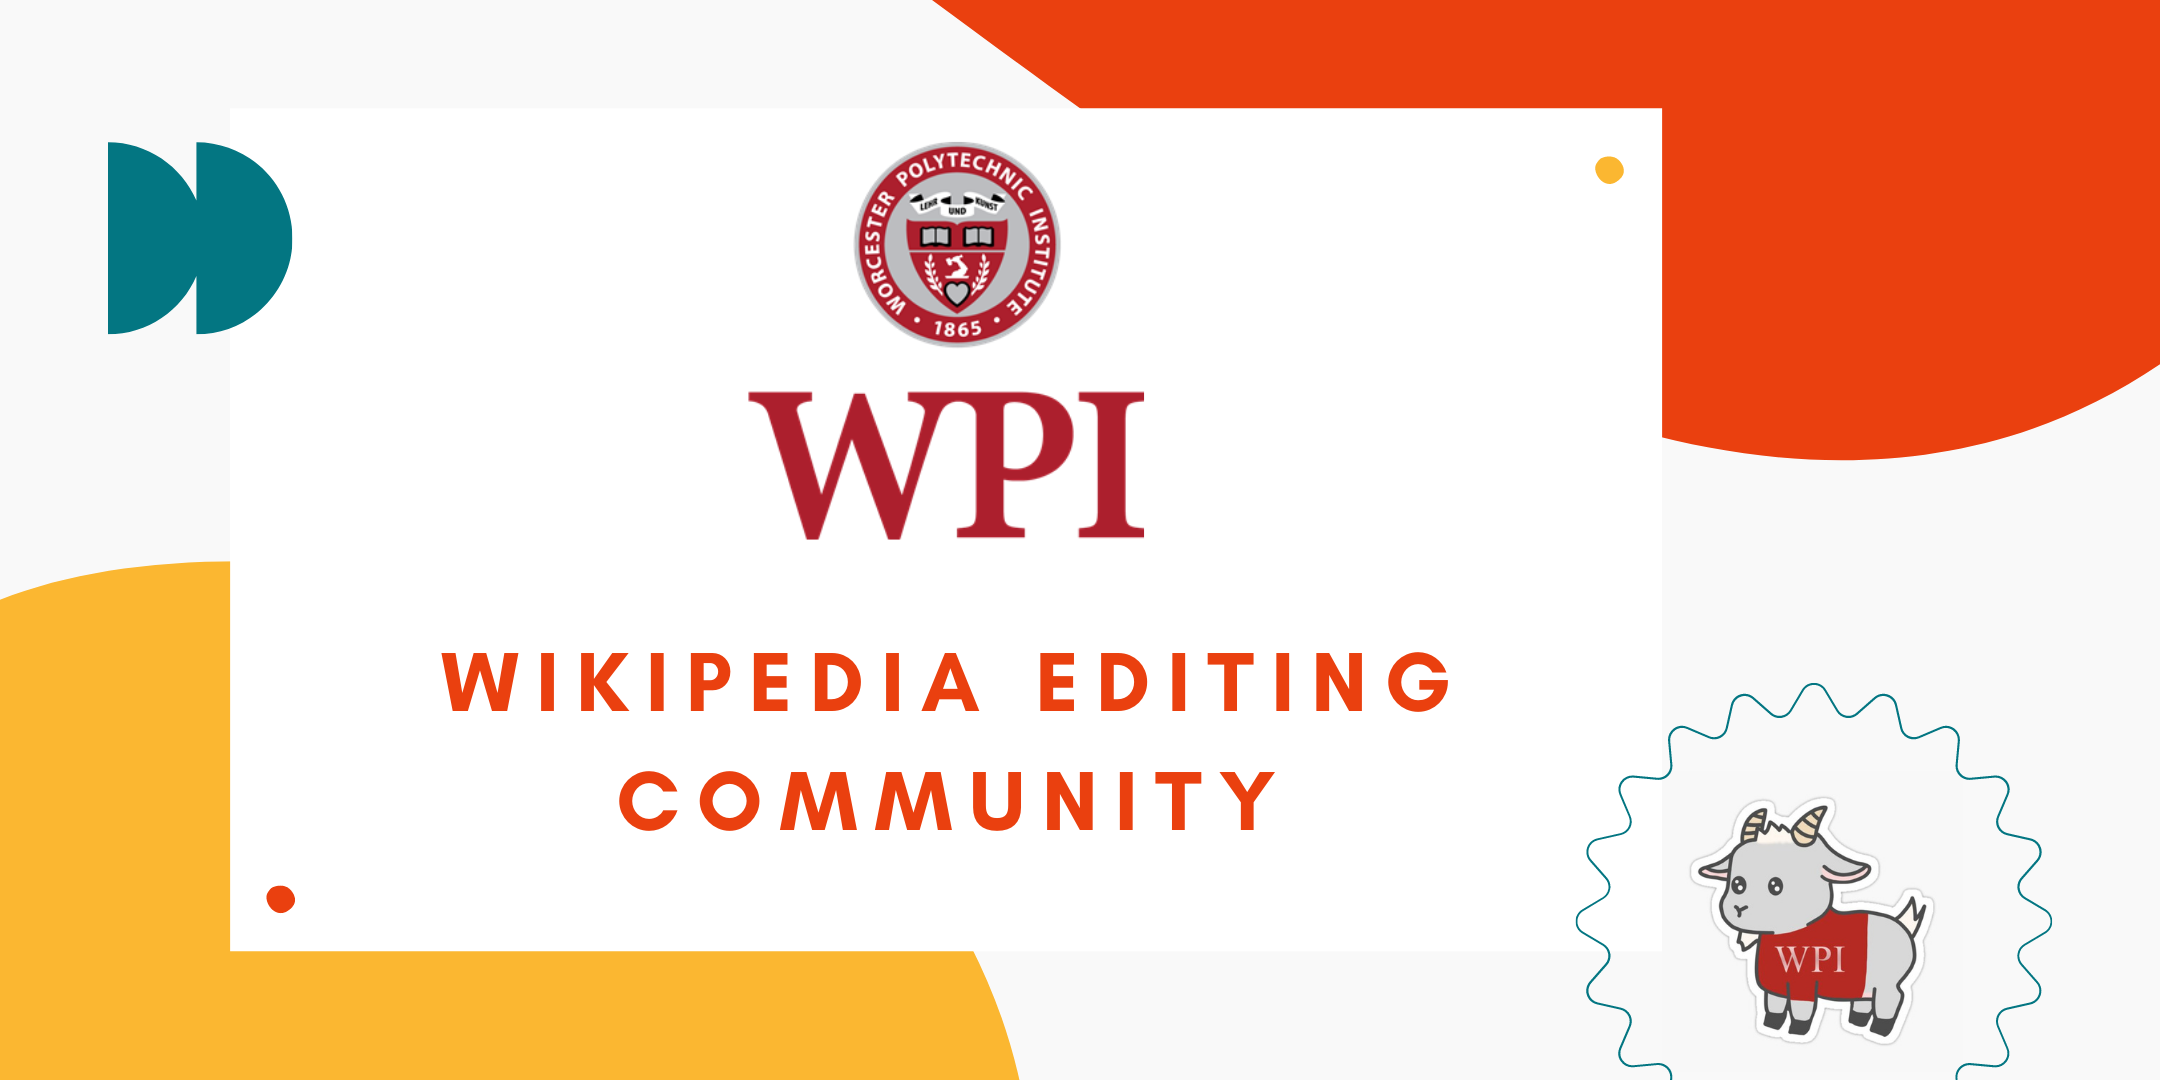 WPI Wikipedia Editing Community banner